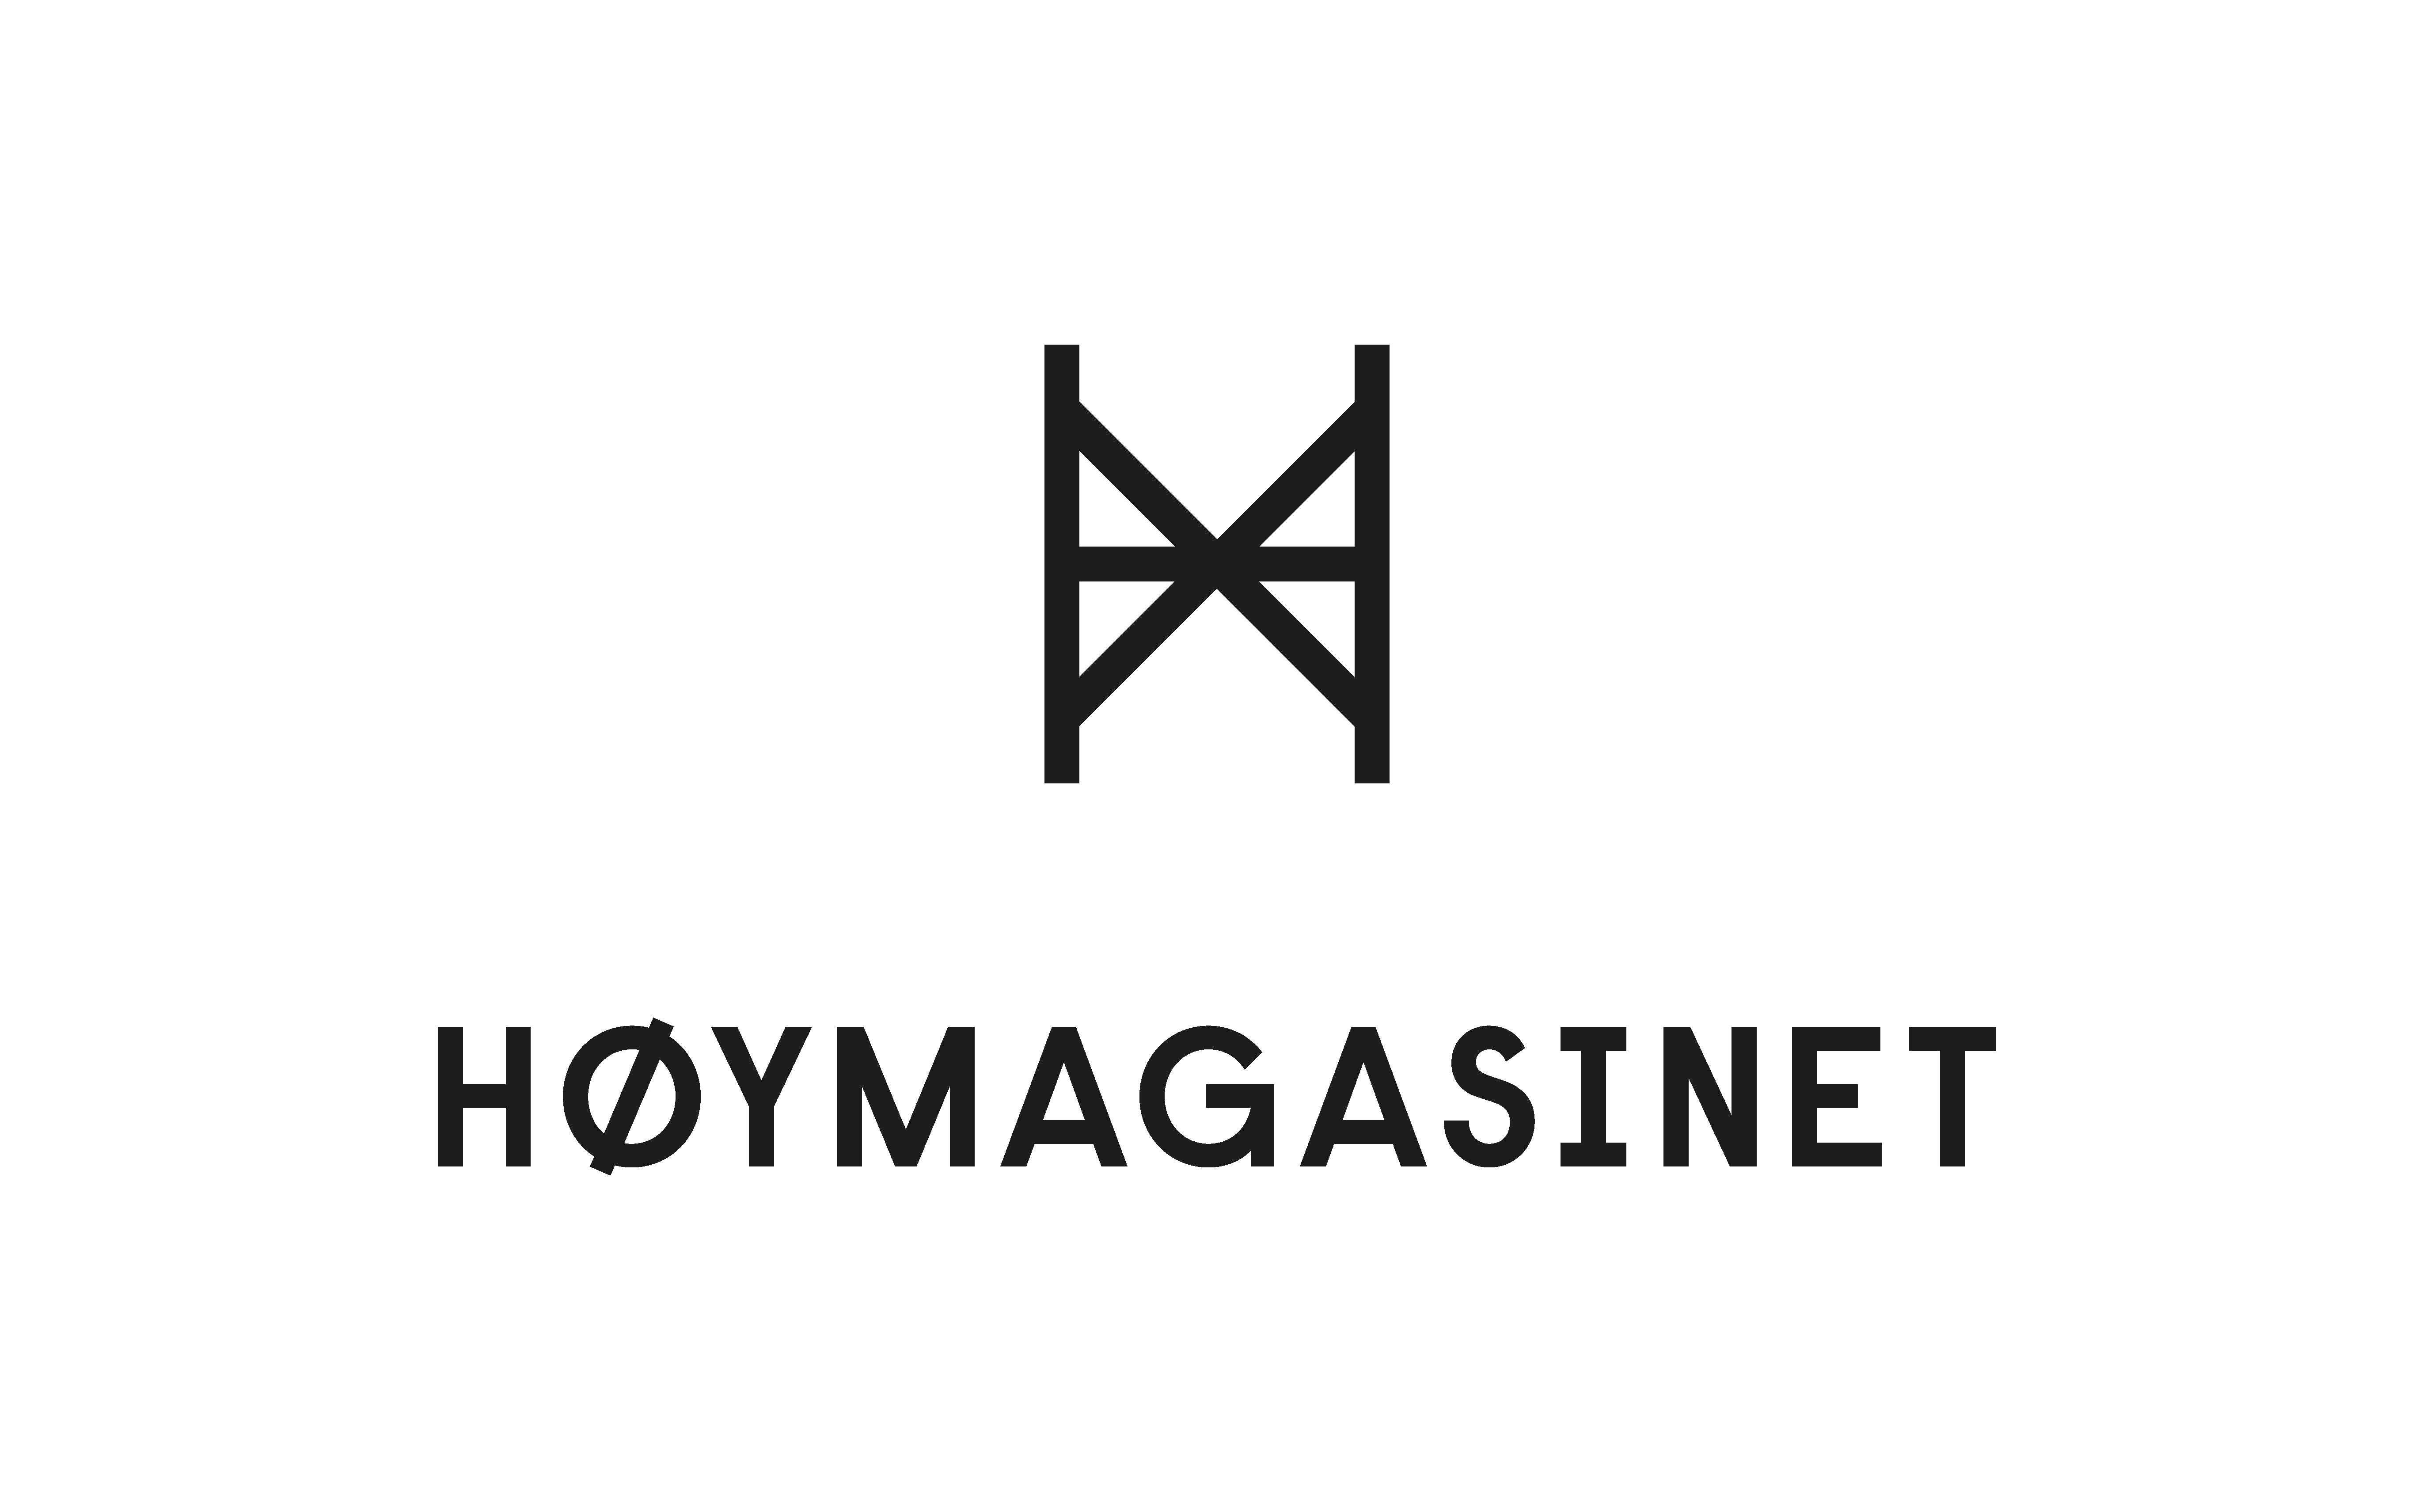 fg_hymagasinet_logo_staende_svart-01-01